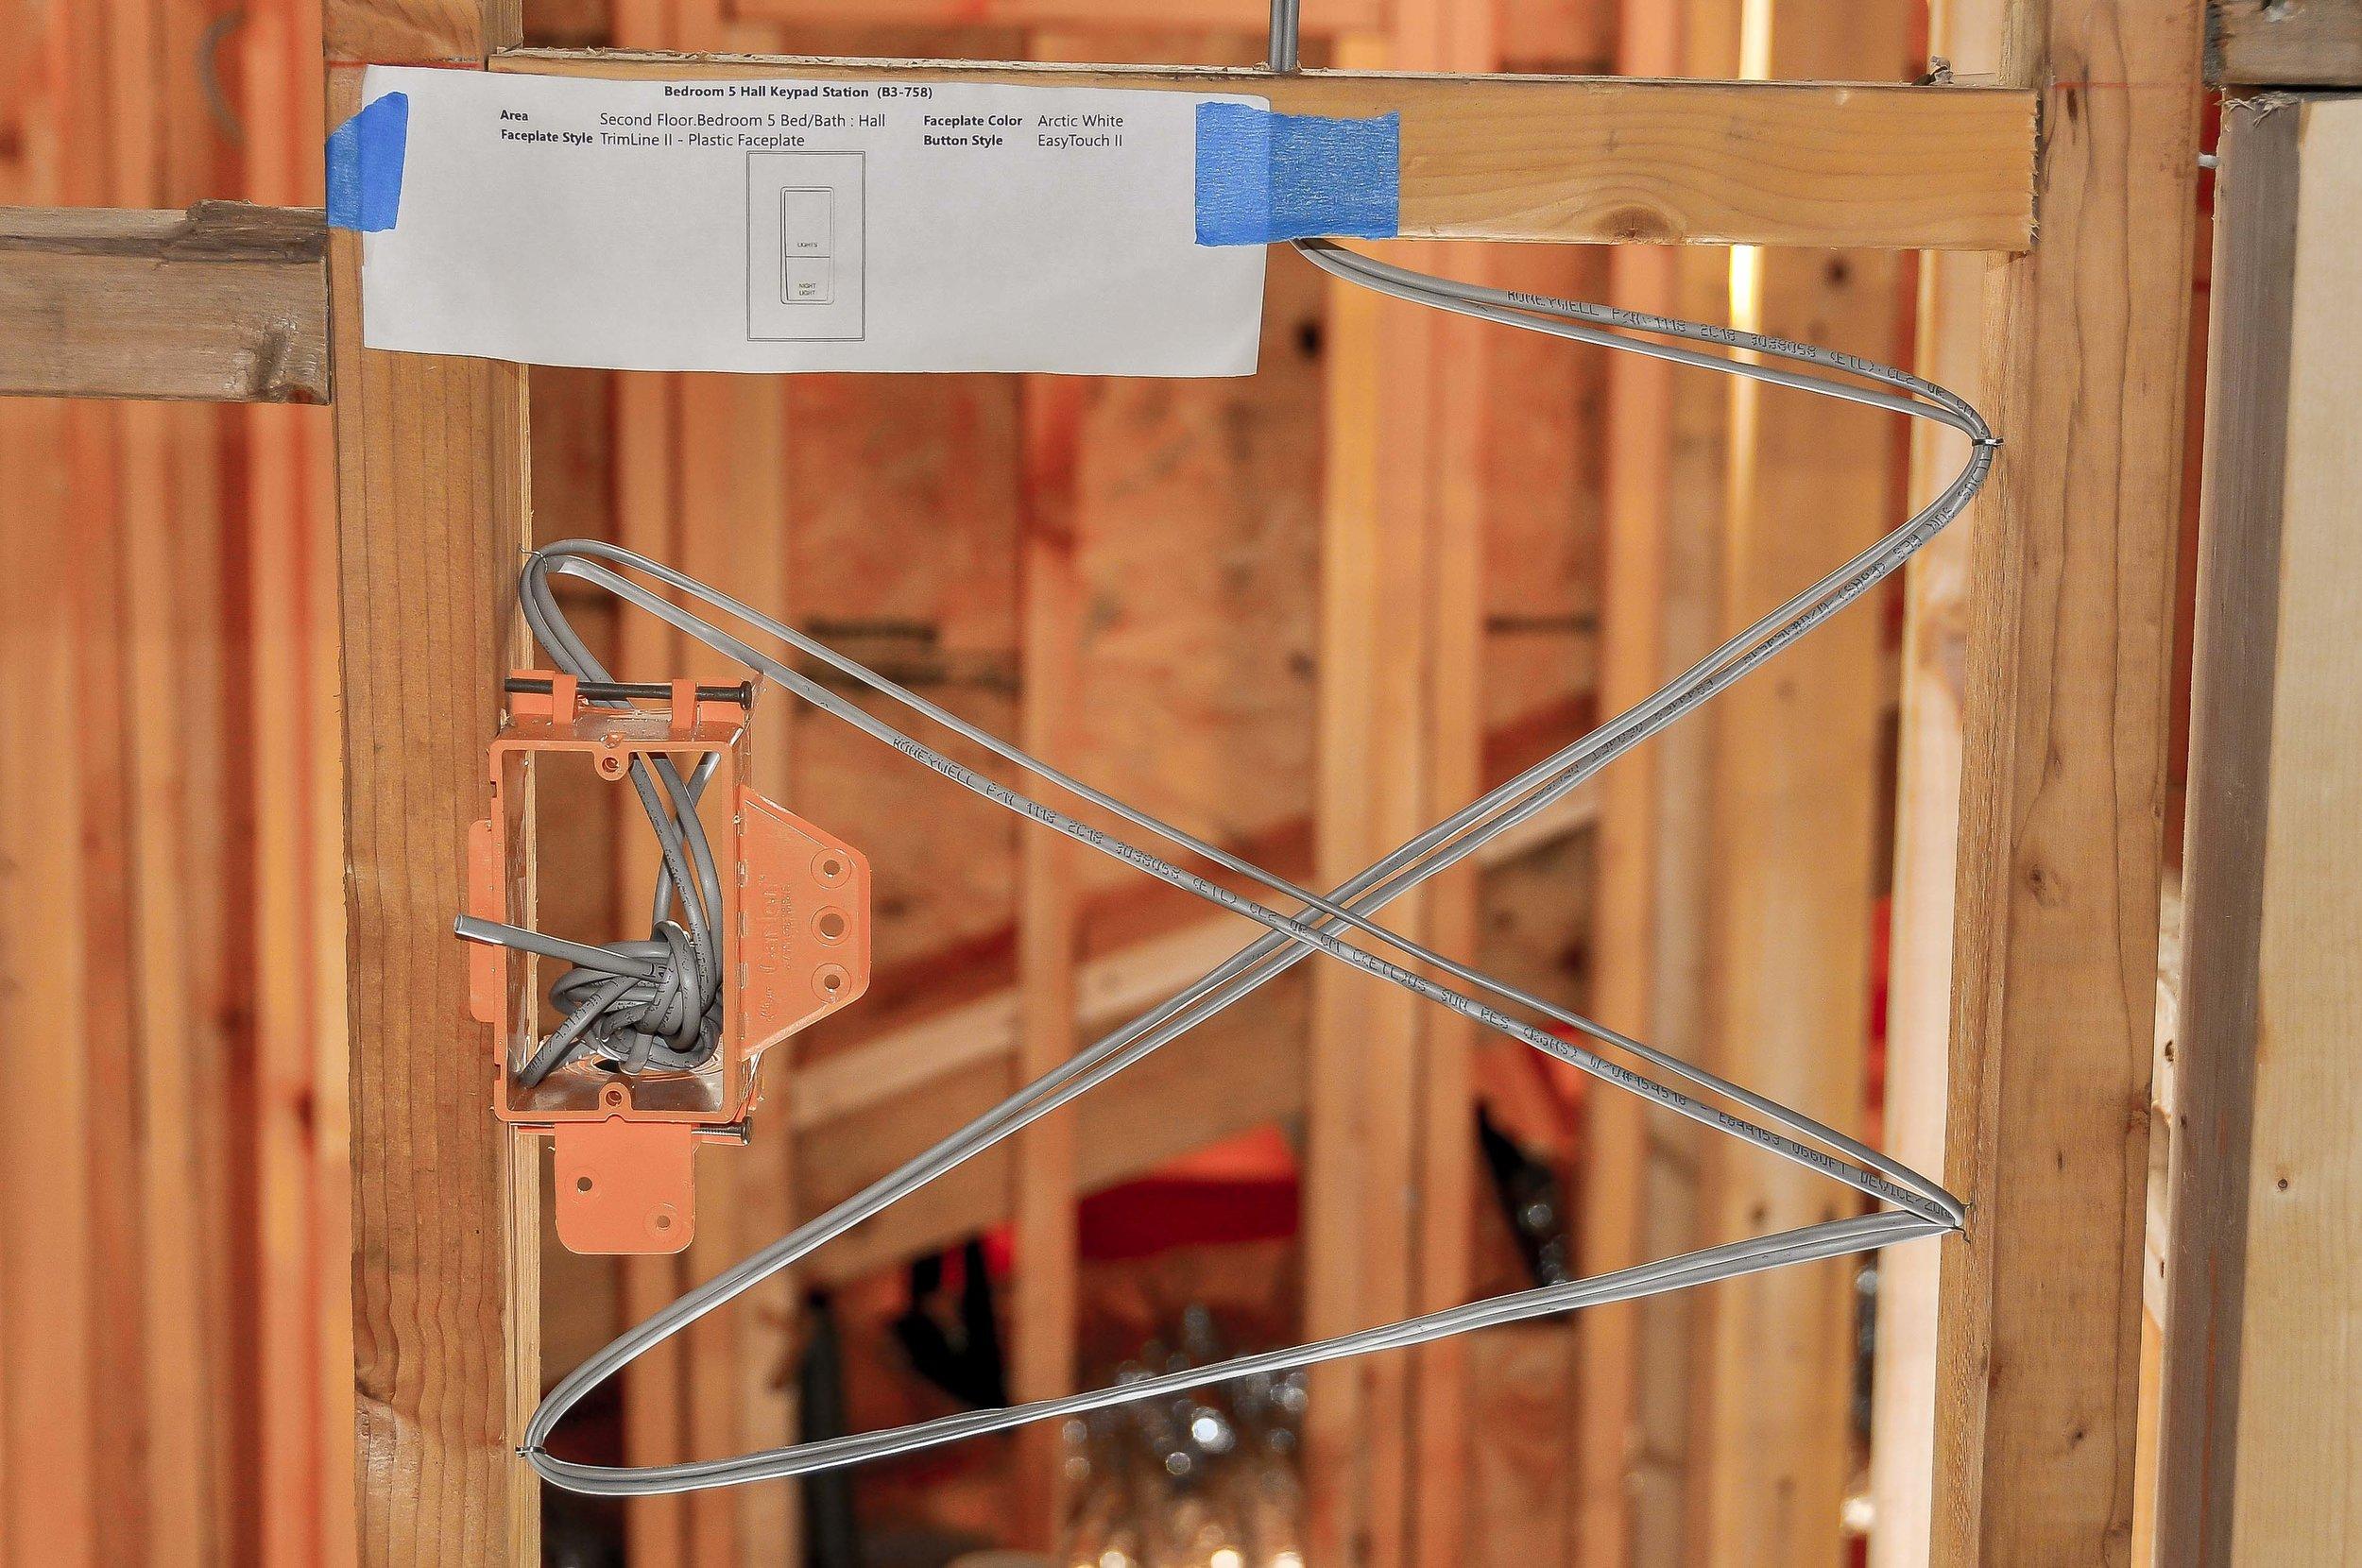 lighting engraving schedule Austin Spanish Oaks Prewire.jpg